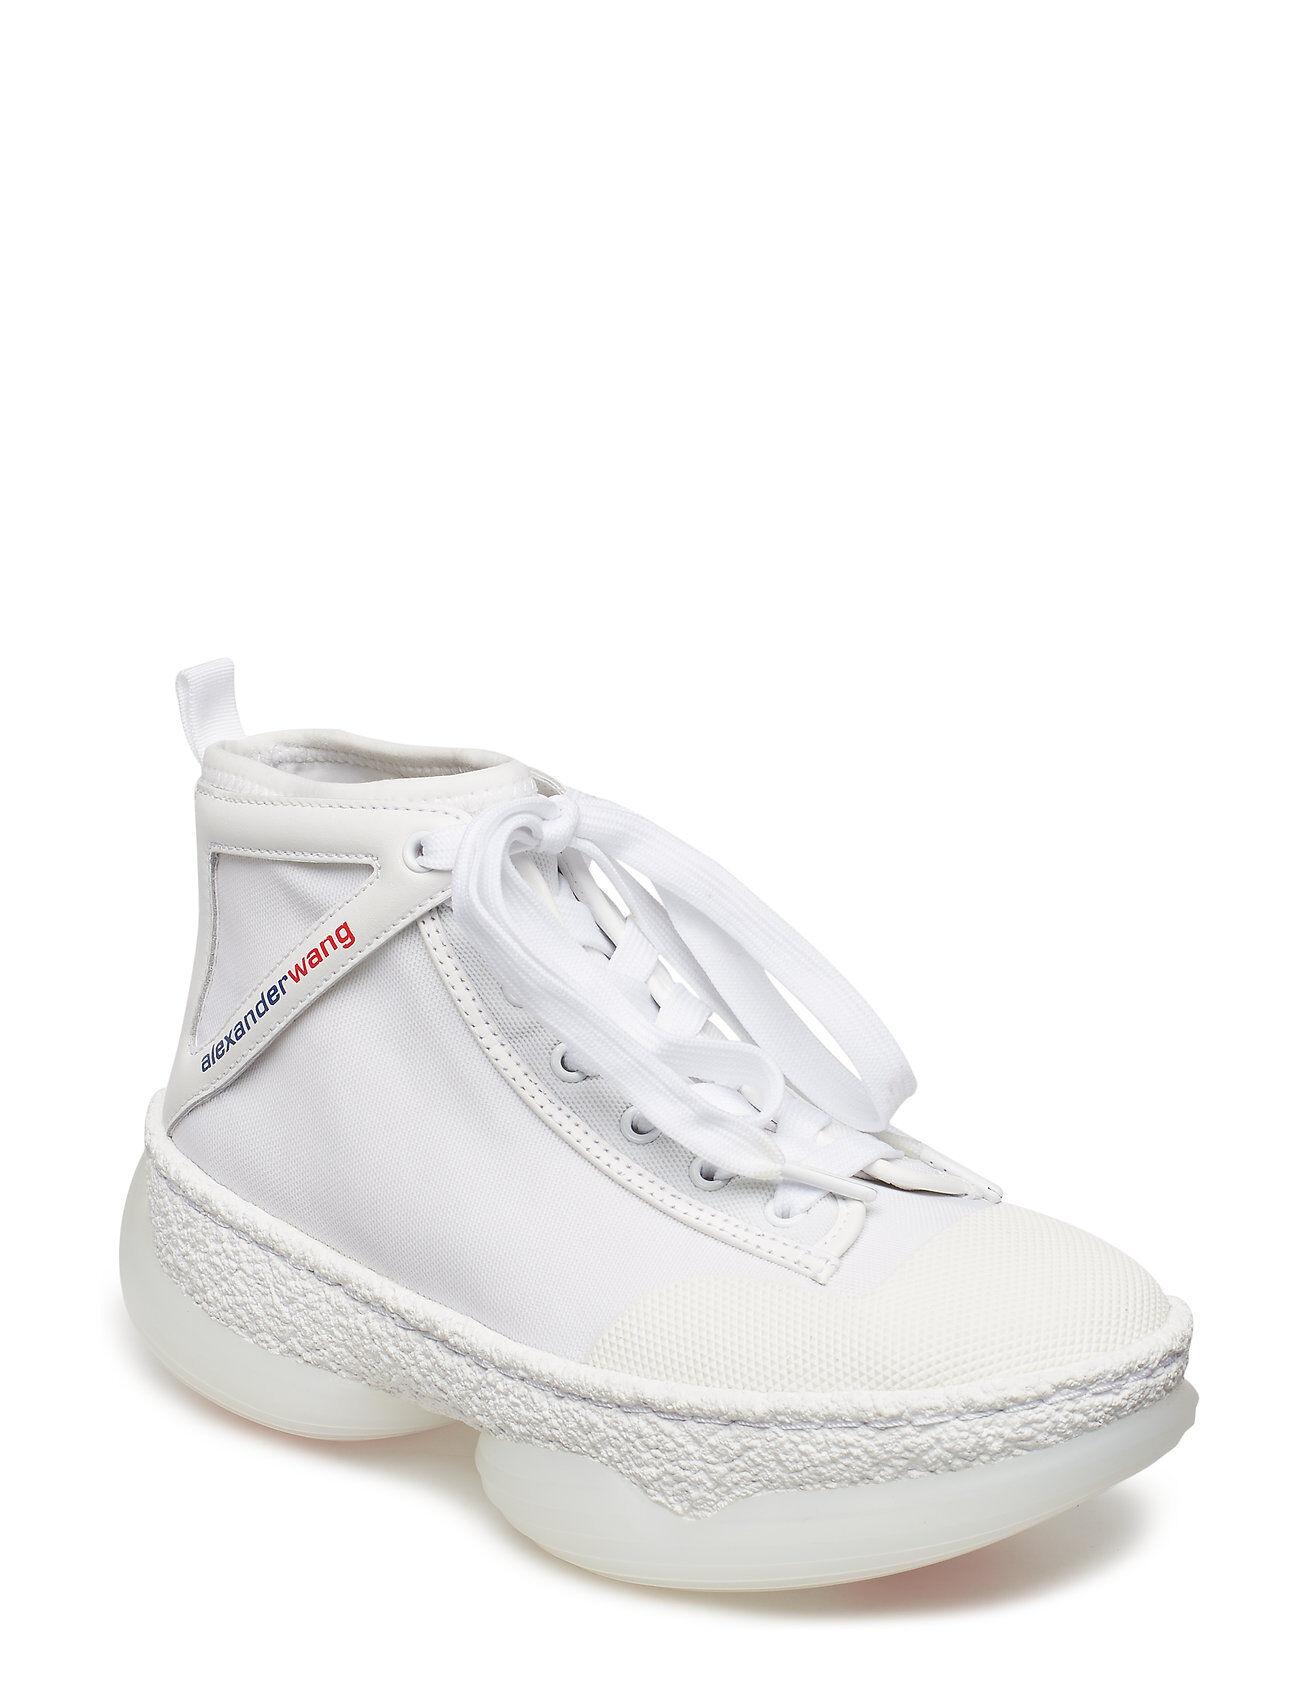 Alexander Wang A1 Sneaker White Calf/Mesh